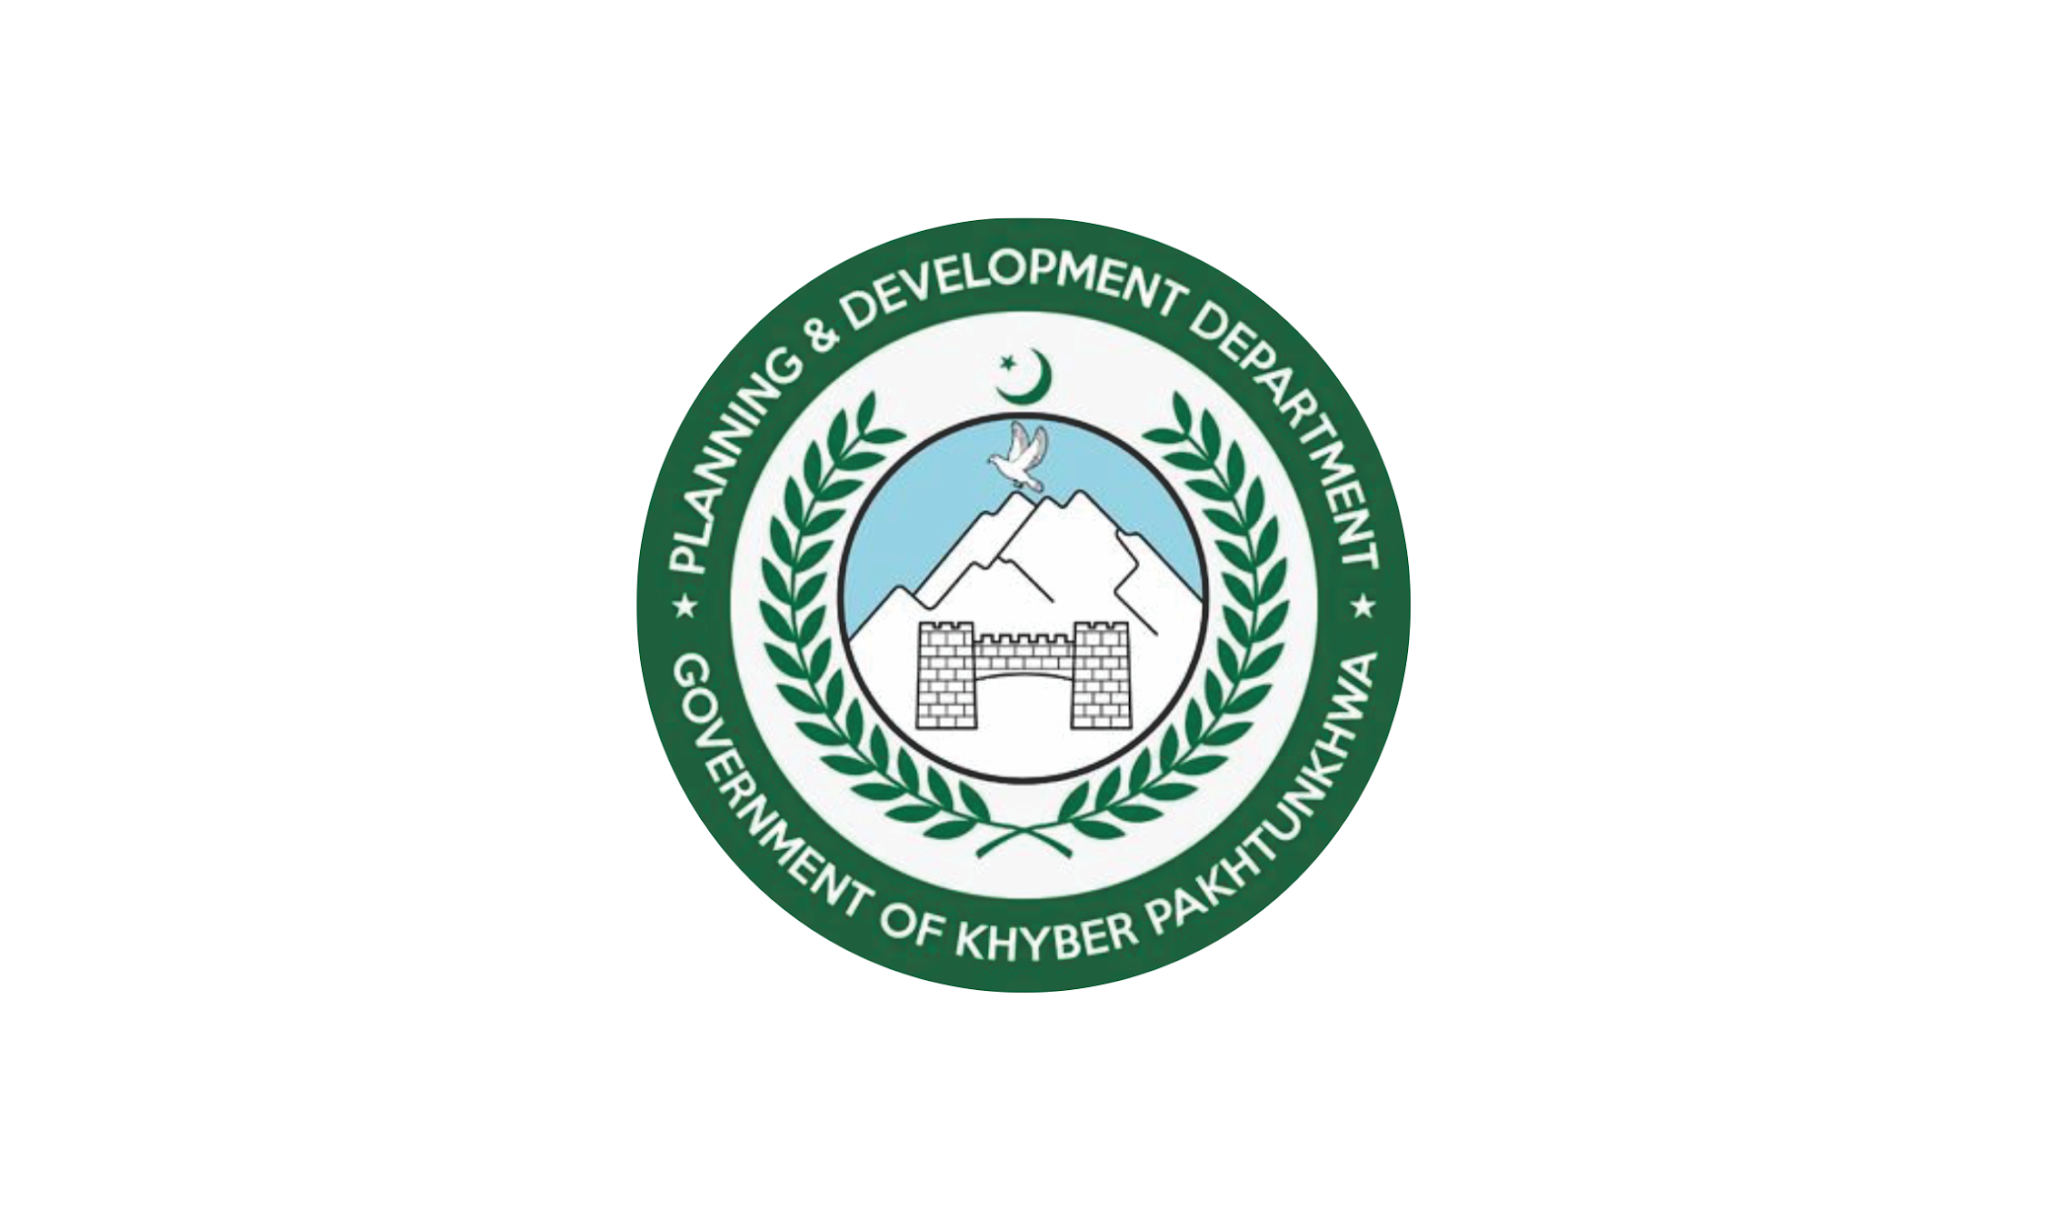 Planning and Development Department KPK Jobs 2021 – Apply via CTSP